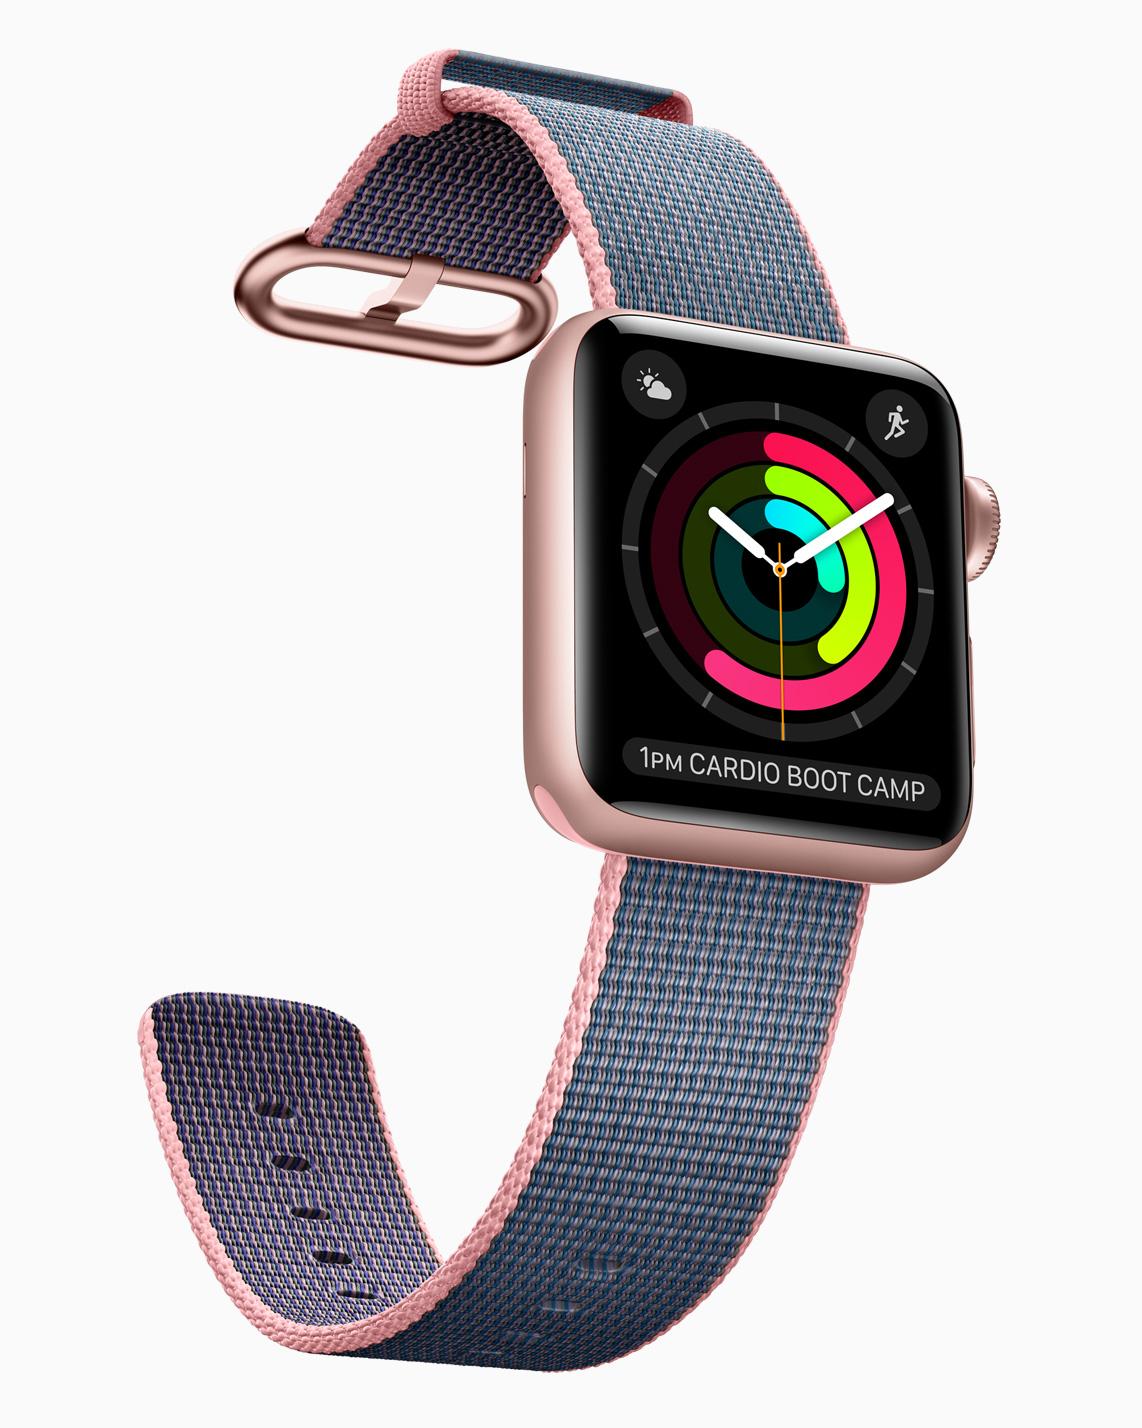 Apple Watch Series 2 (5)